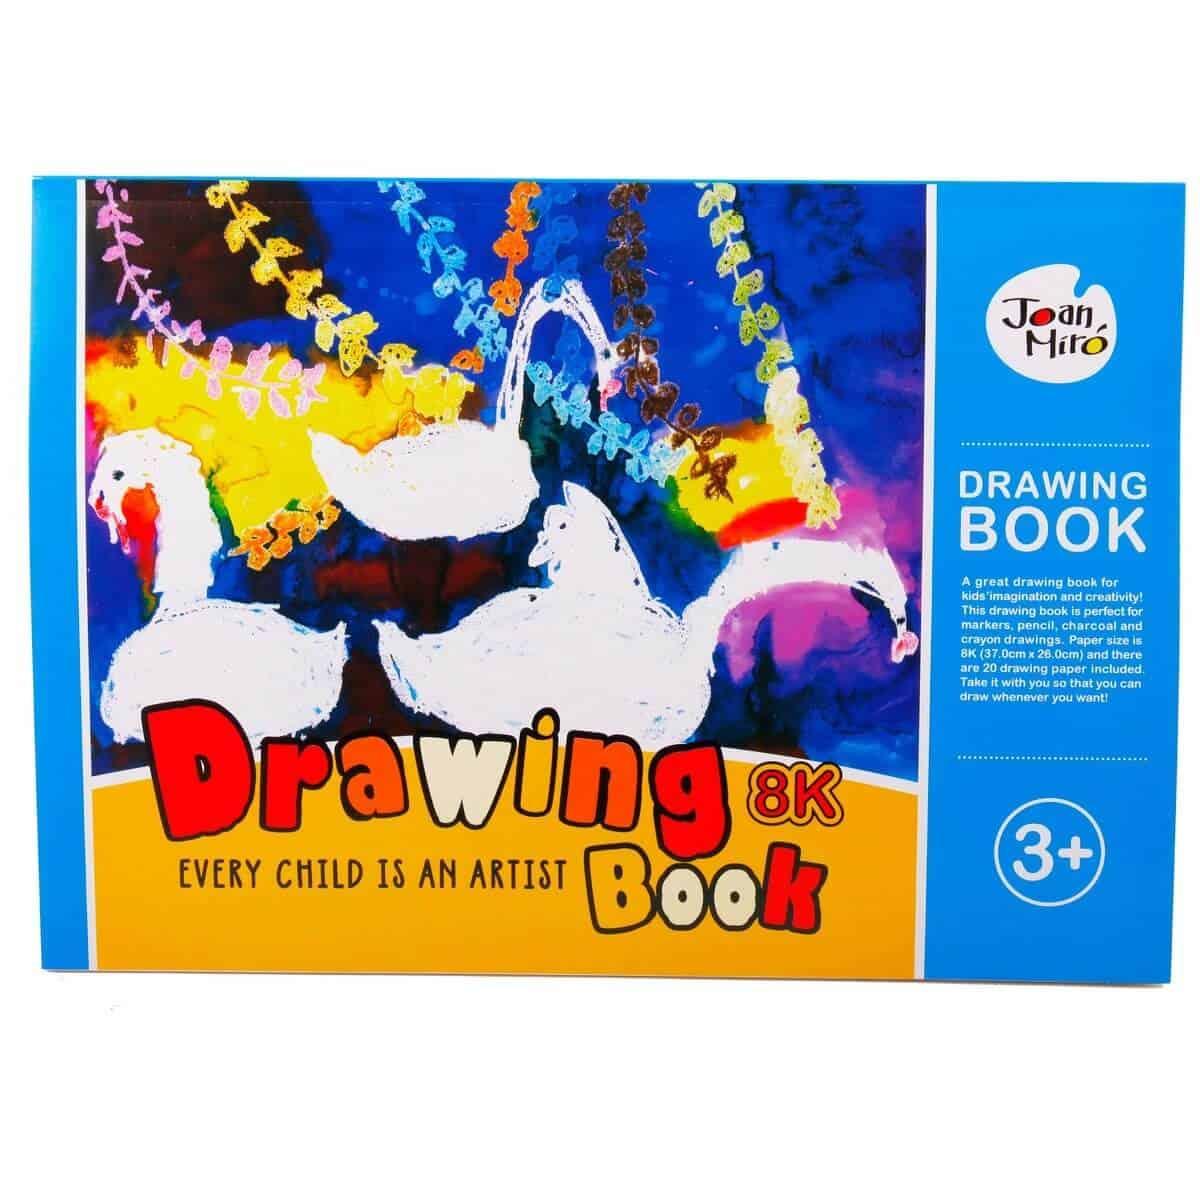 Joan Miro Drawing Book 8K สมุดวาดเขียน